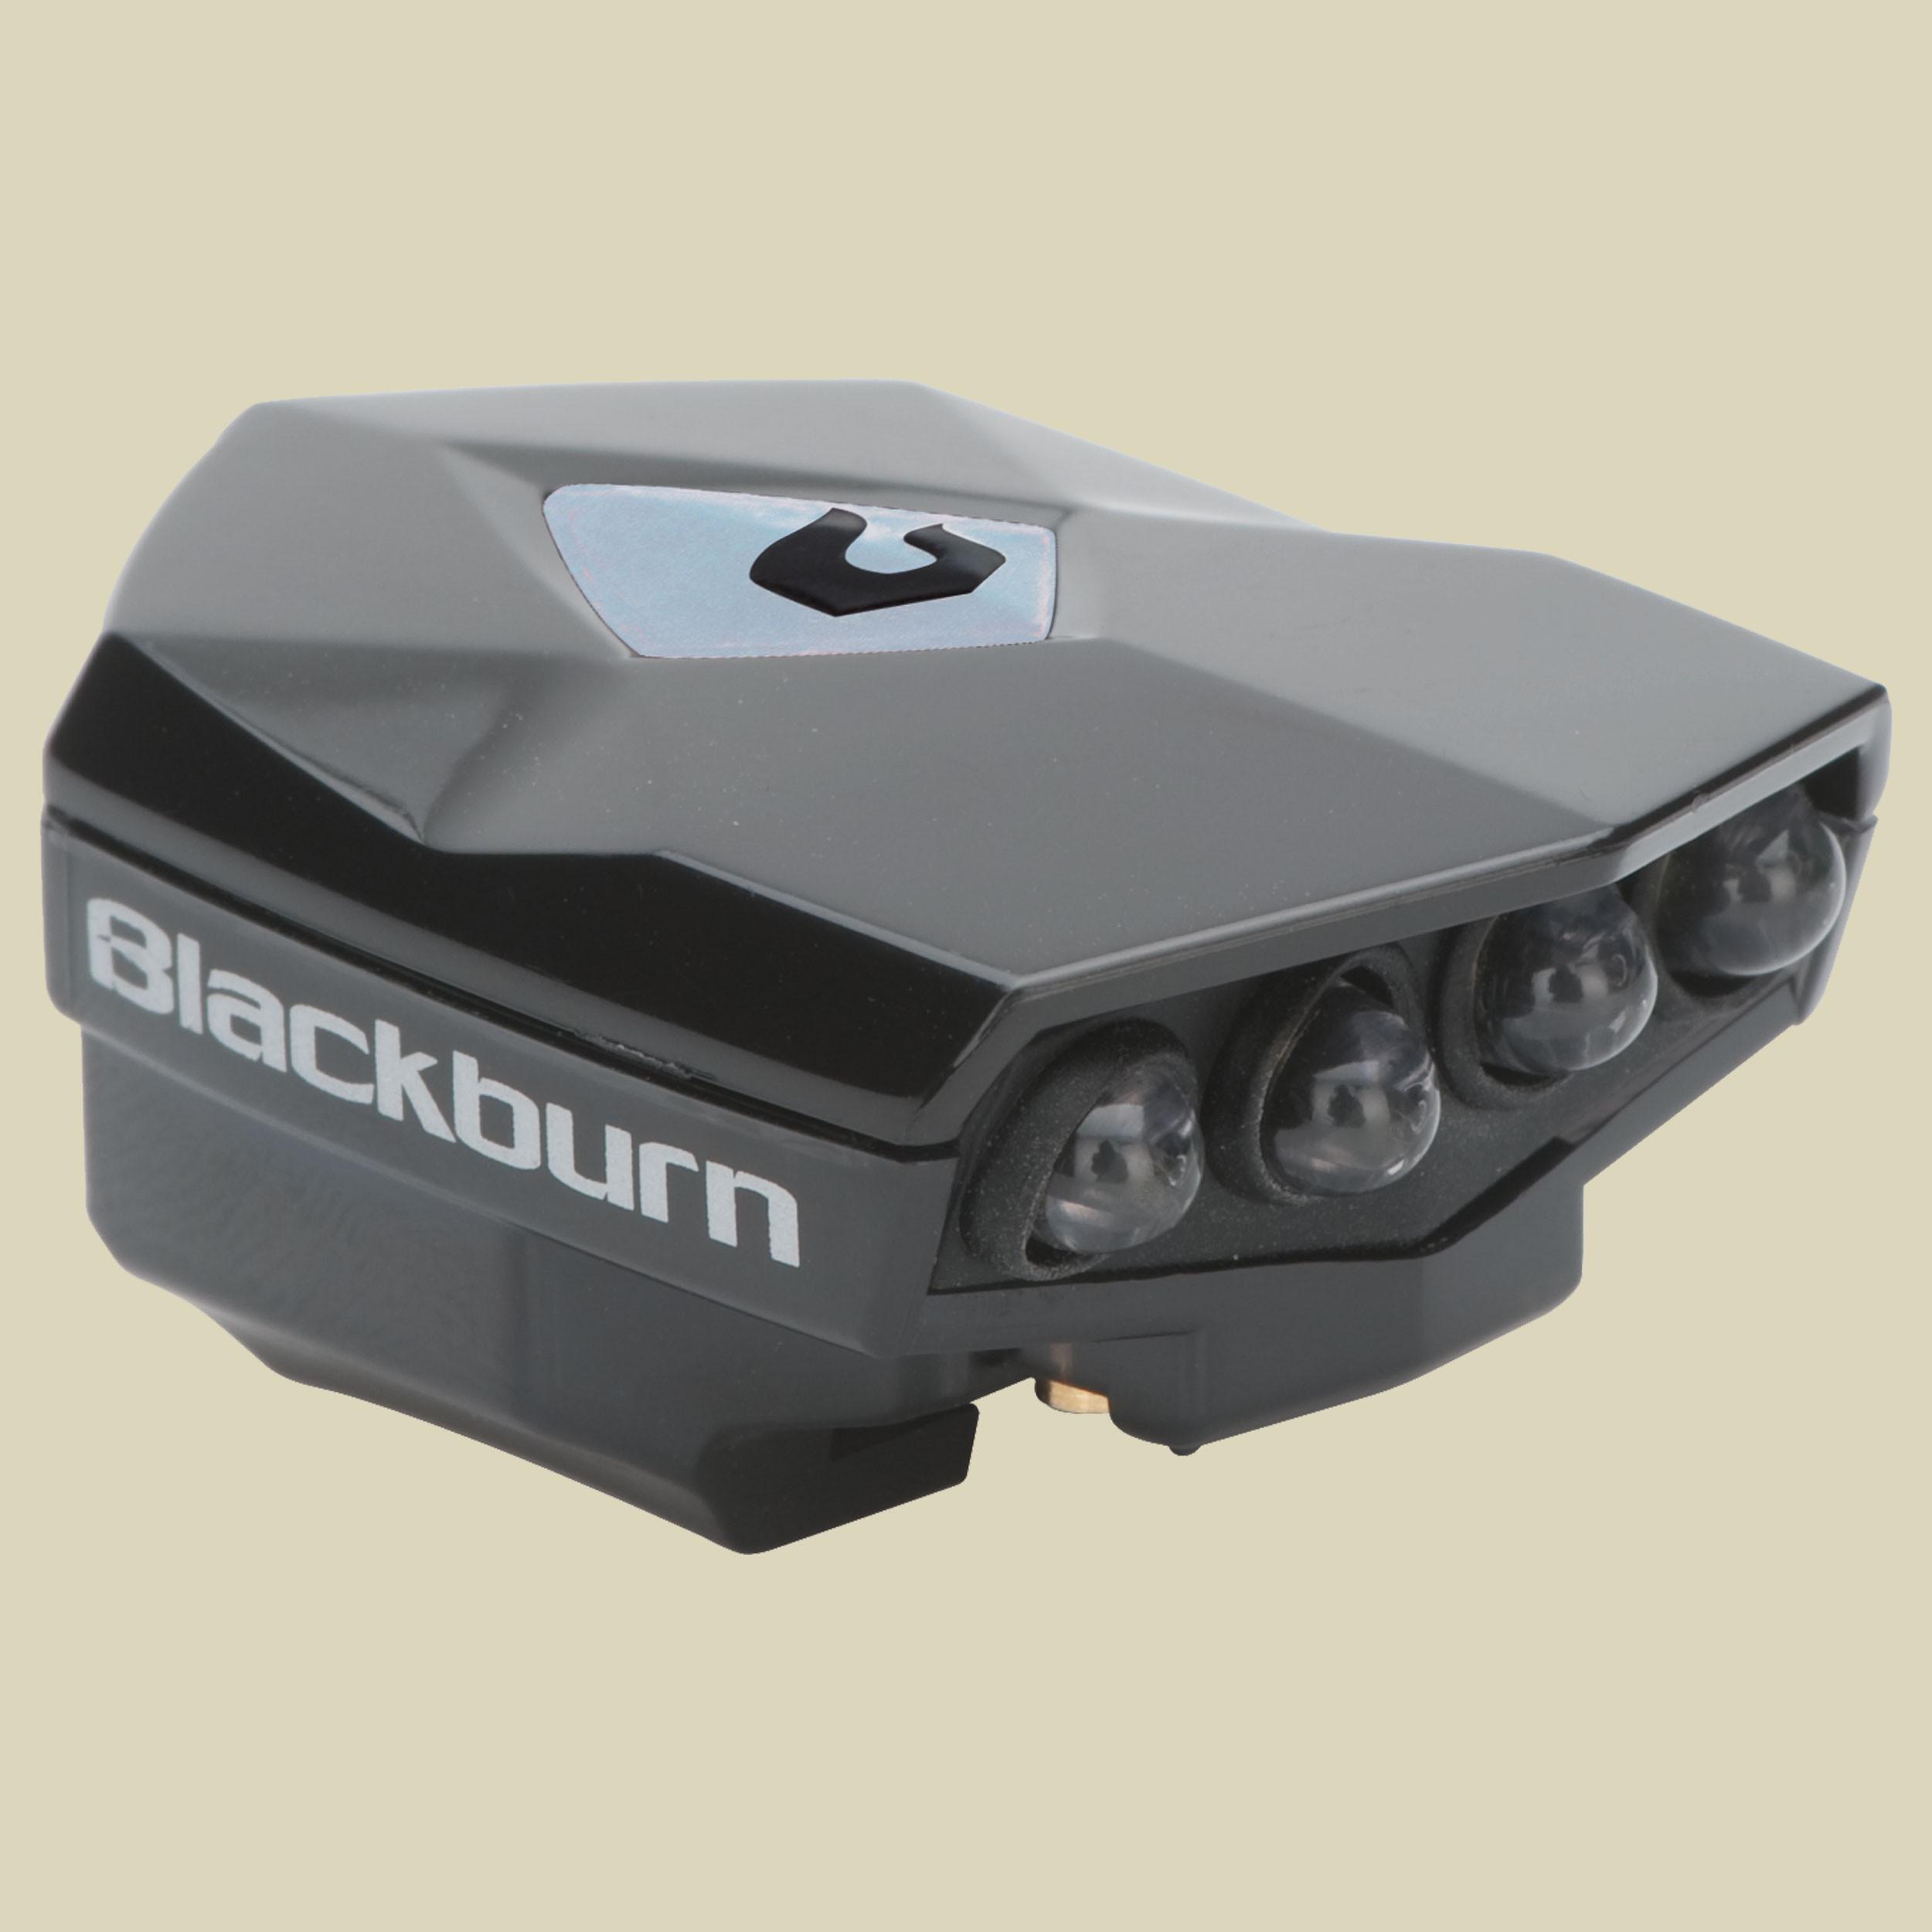 Blackburn_Flea_Front_USB_schwarz_fallback